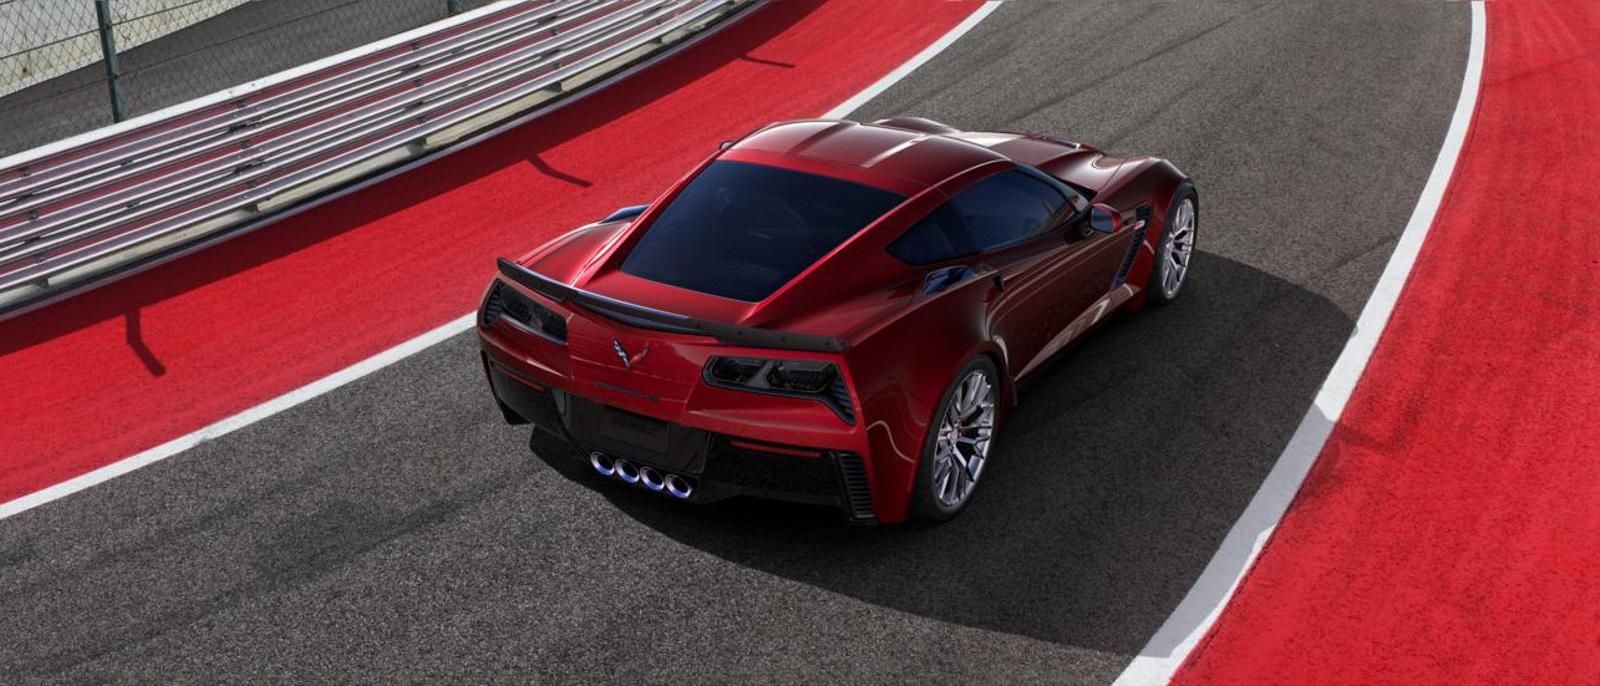 2016 Chevy Corvette Z06 Rear